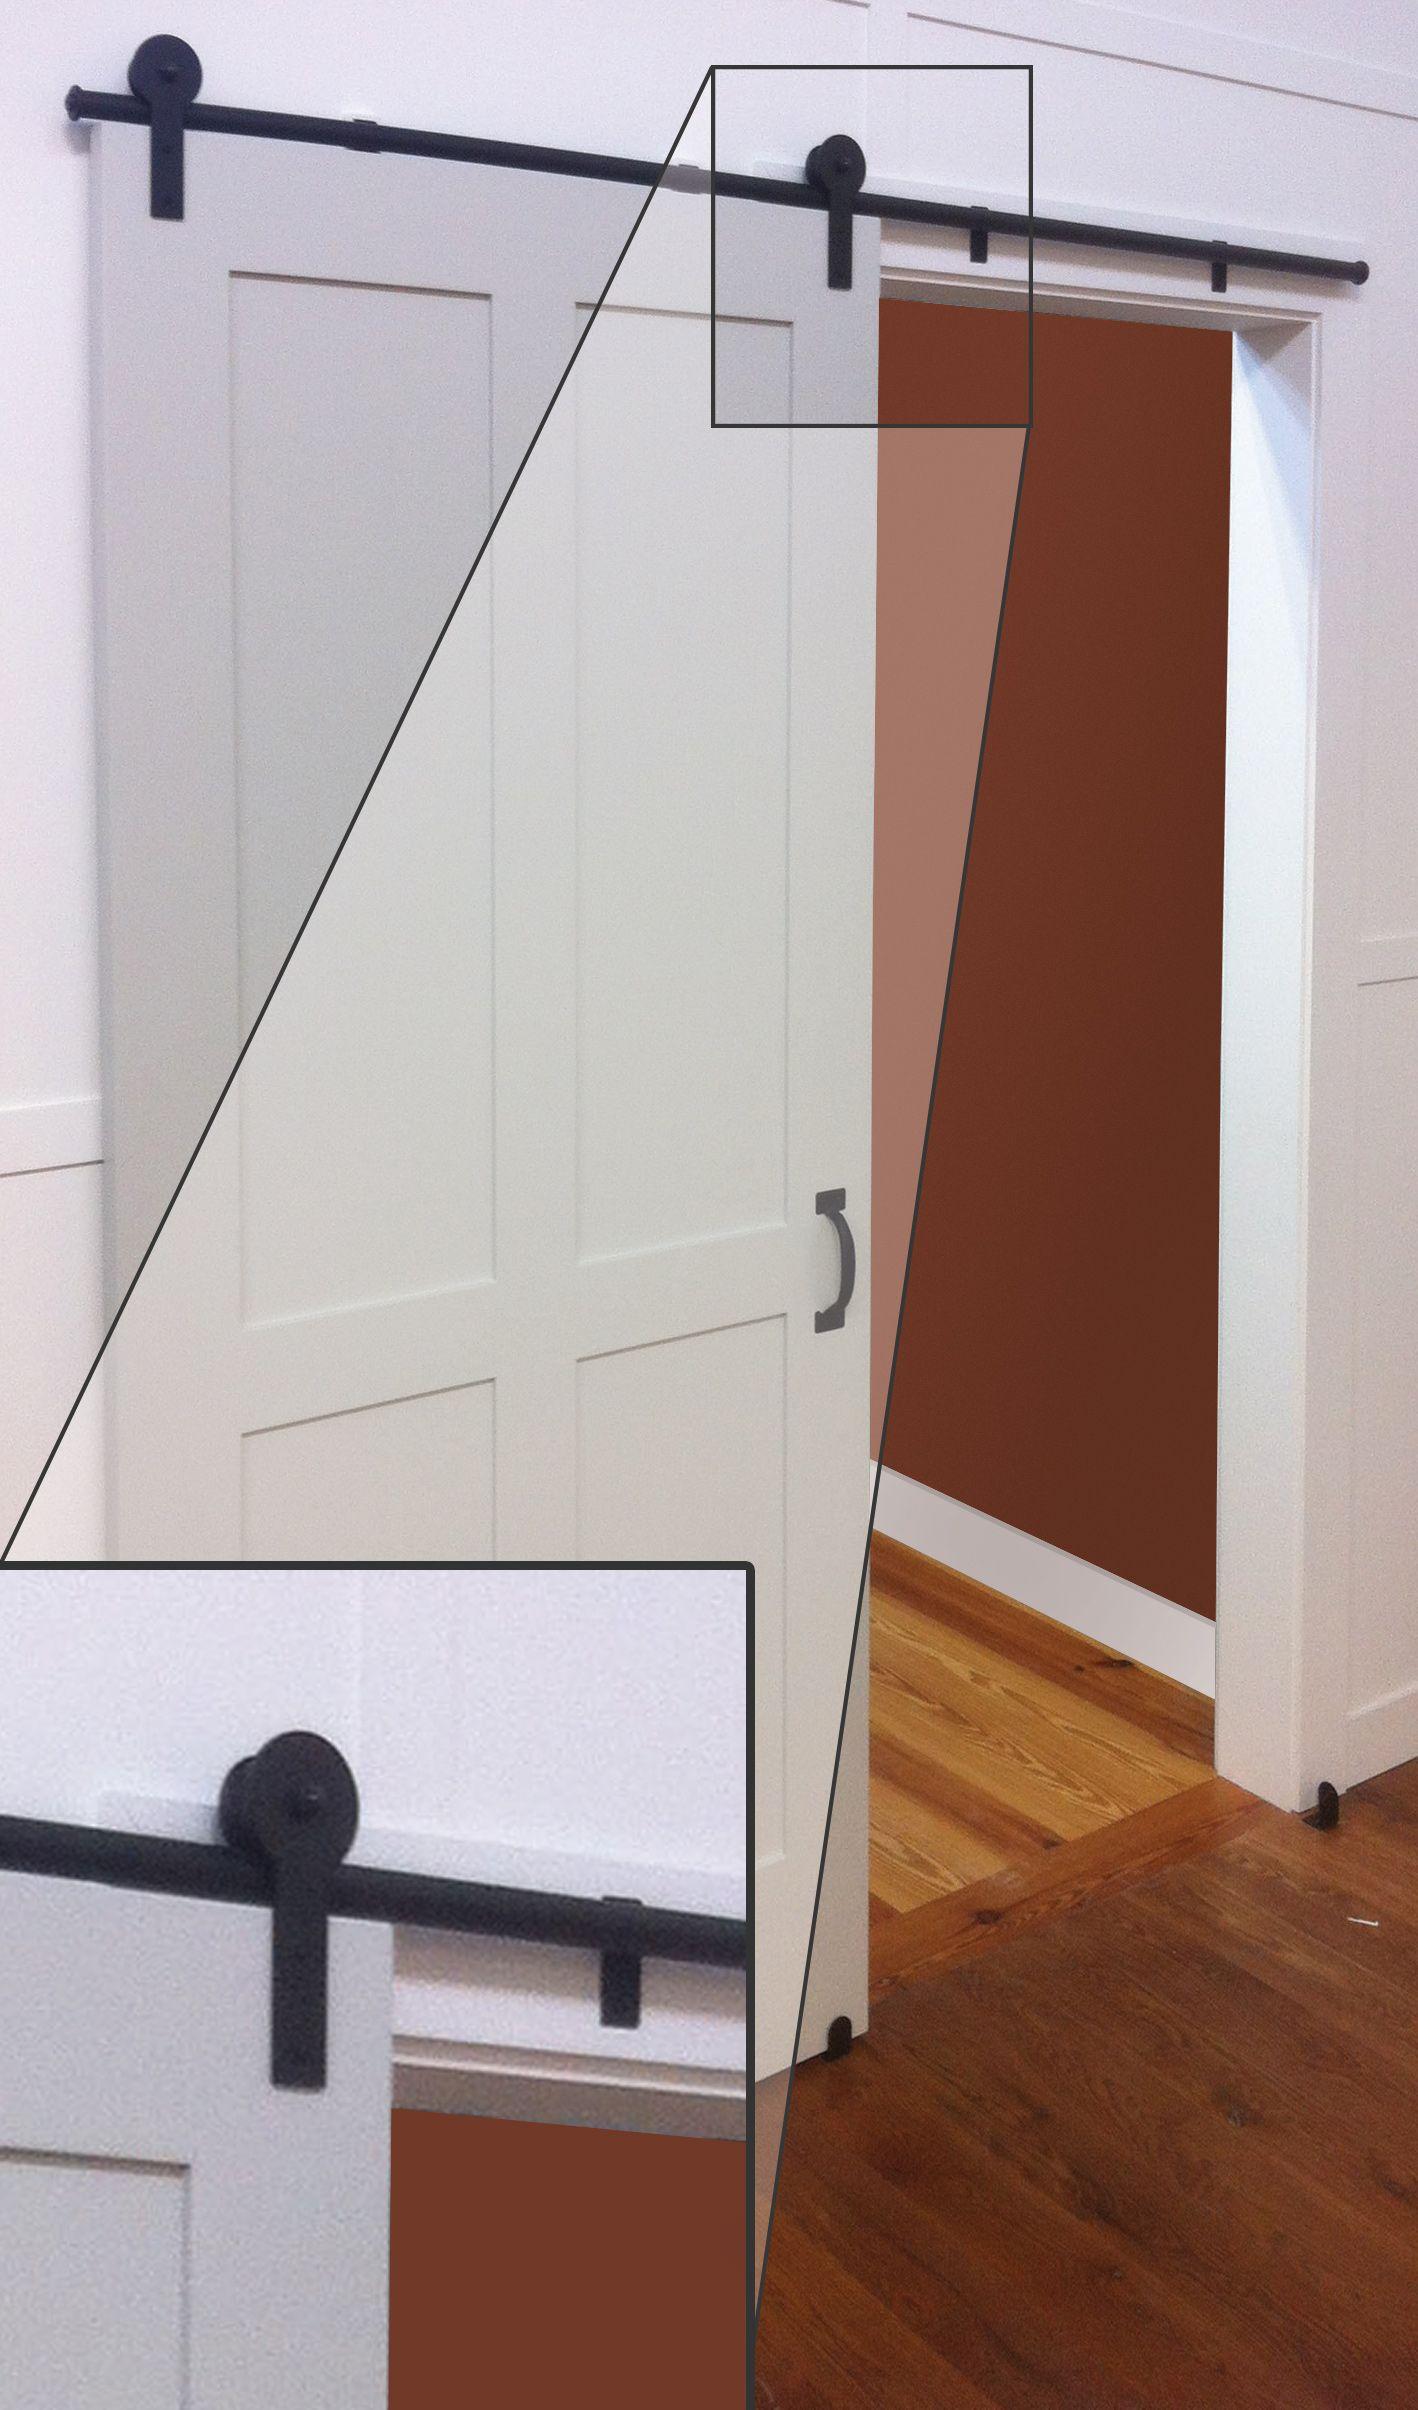 Change Up The Look Of Your Interior Doors! QuietGlide™ Rolling Door  Hardware Transforms Any